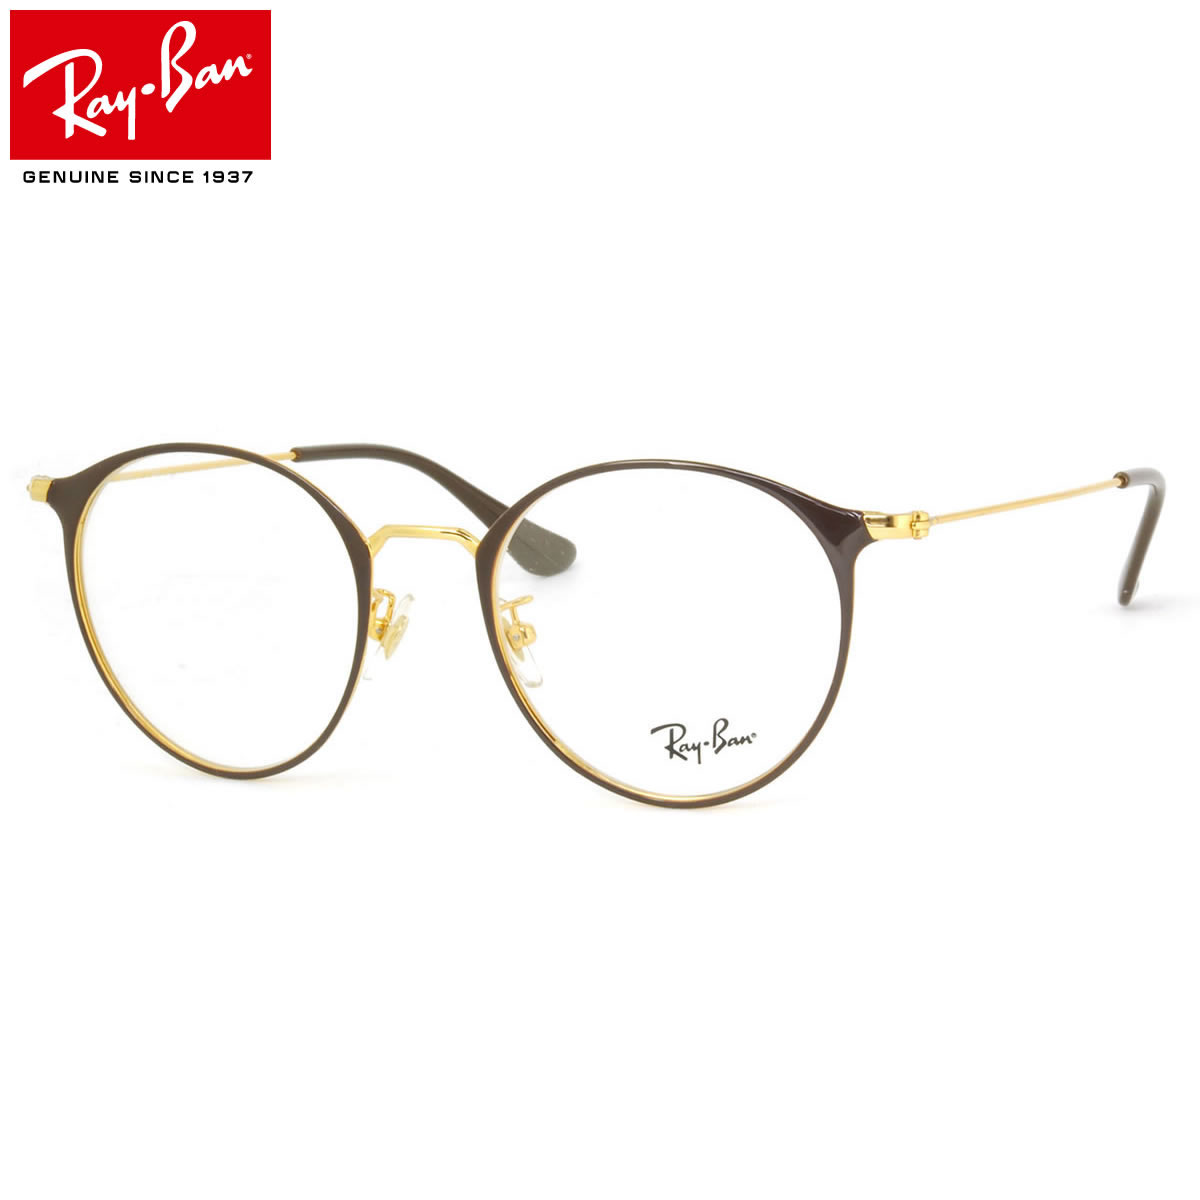 Ray-Ban メガネ 正規商品販売店 人気ブレゼント 14時までのご注文で即日発送 日本全国送料無料 ギフトバッグ コンビニ手数料無料 レイバン RX6378F レディース メンズ 2905 51 在庫一掃 丸メガネ ラウンド RayBan JPフィット レイバン純正レンズ対応